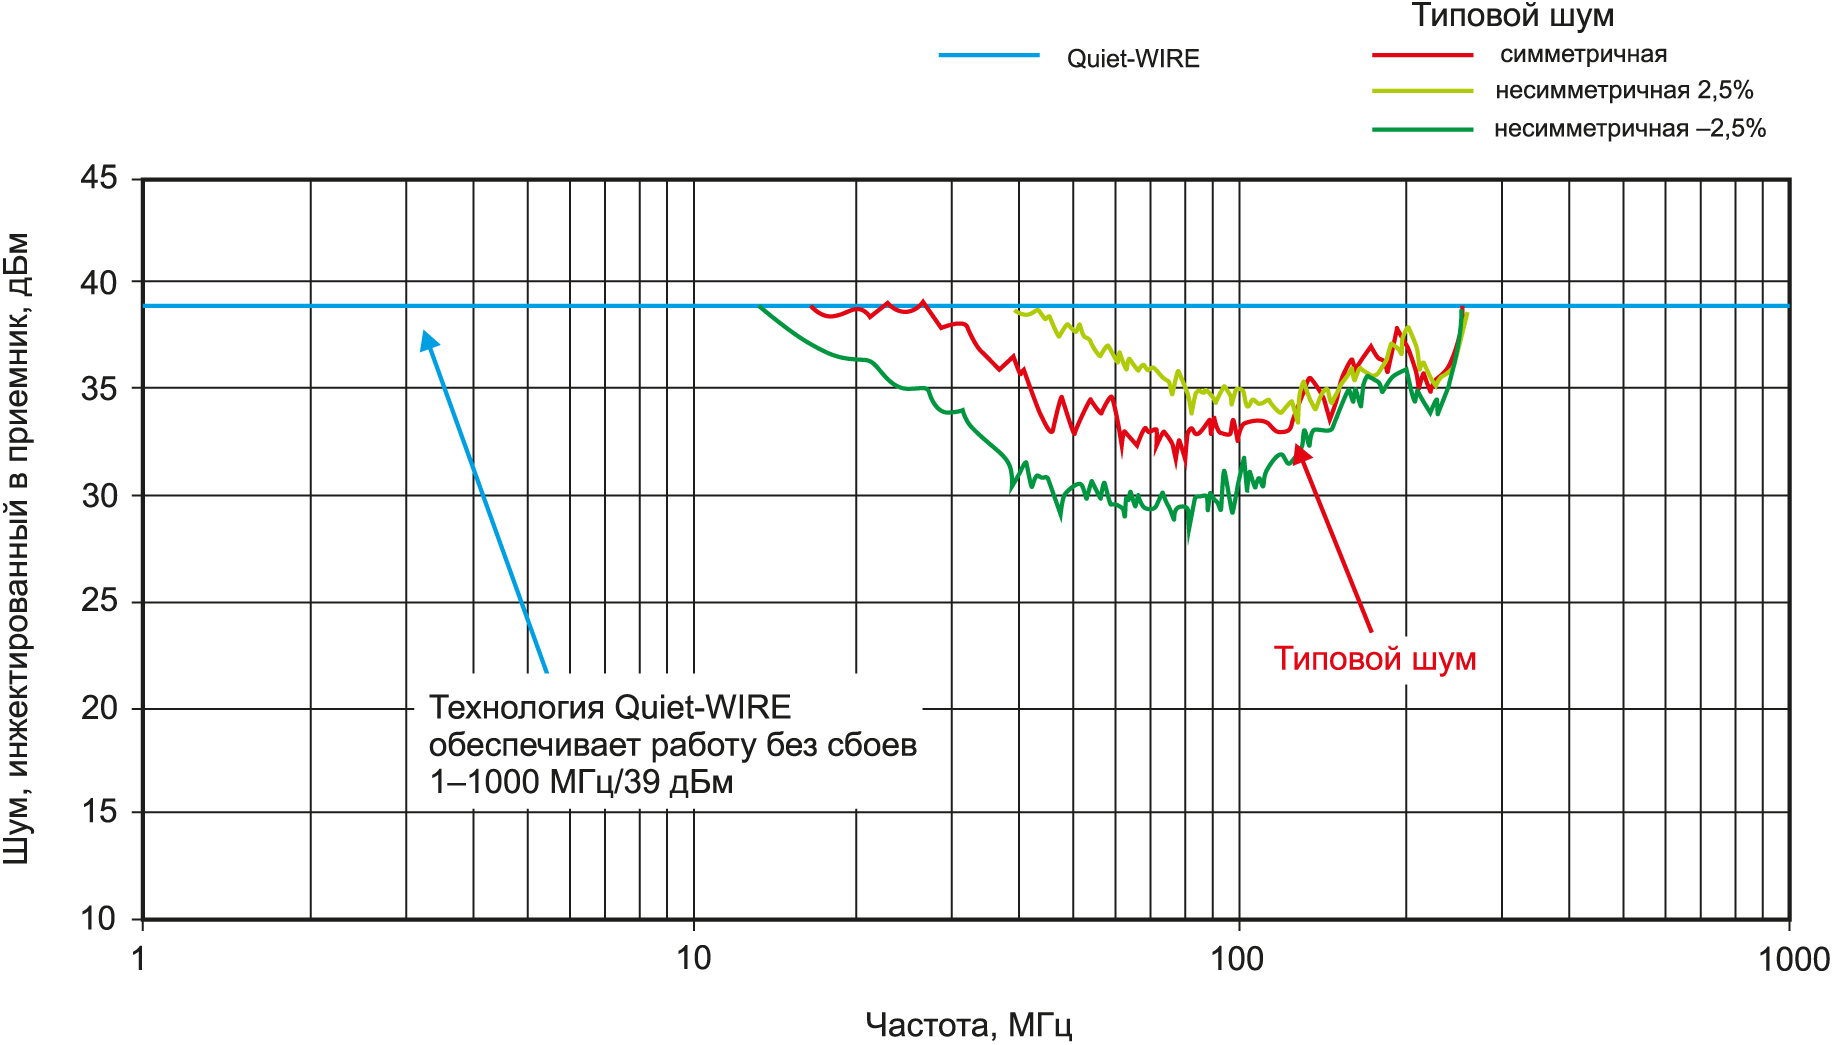 Сравнение производительности Quiet-WIRE